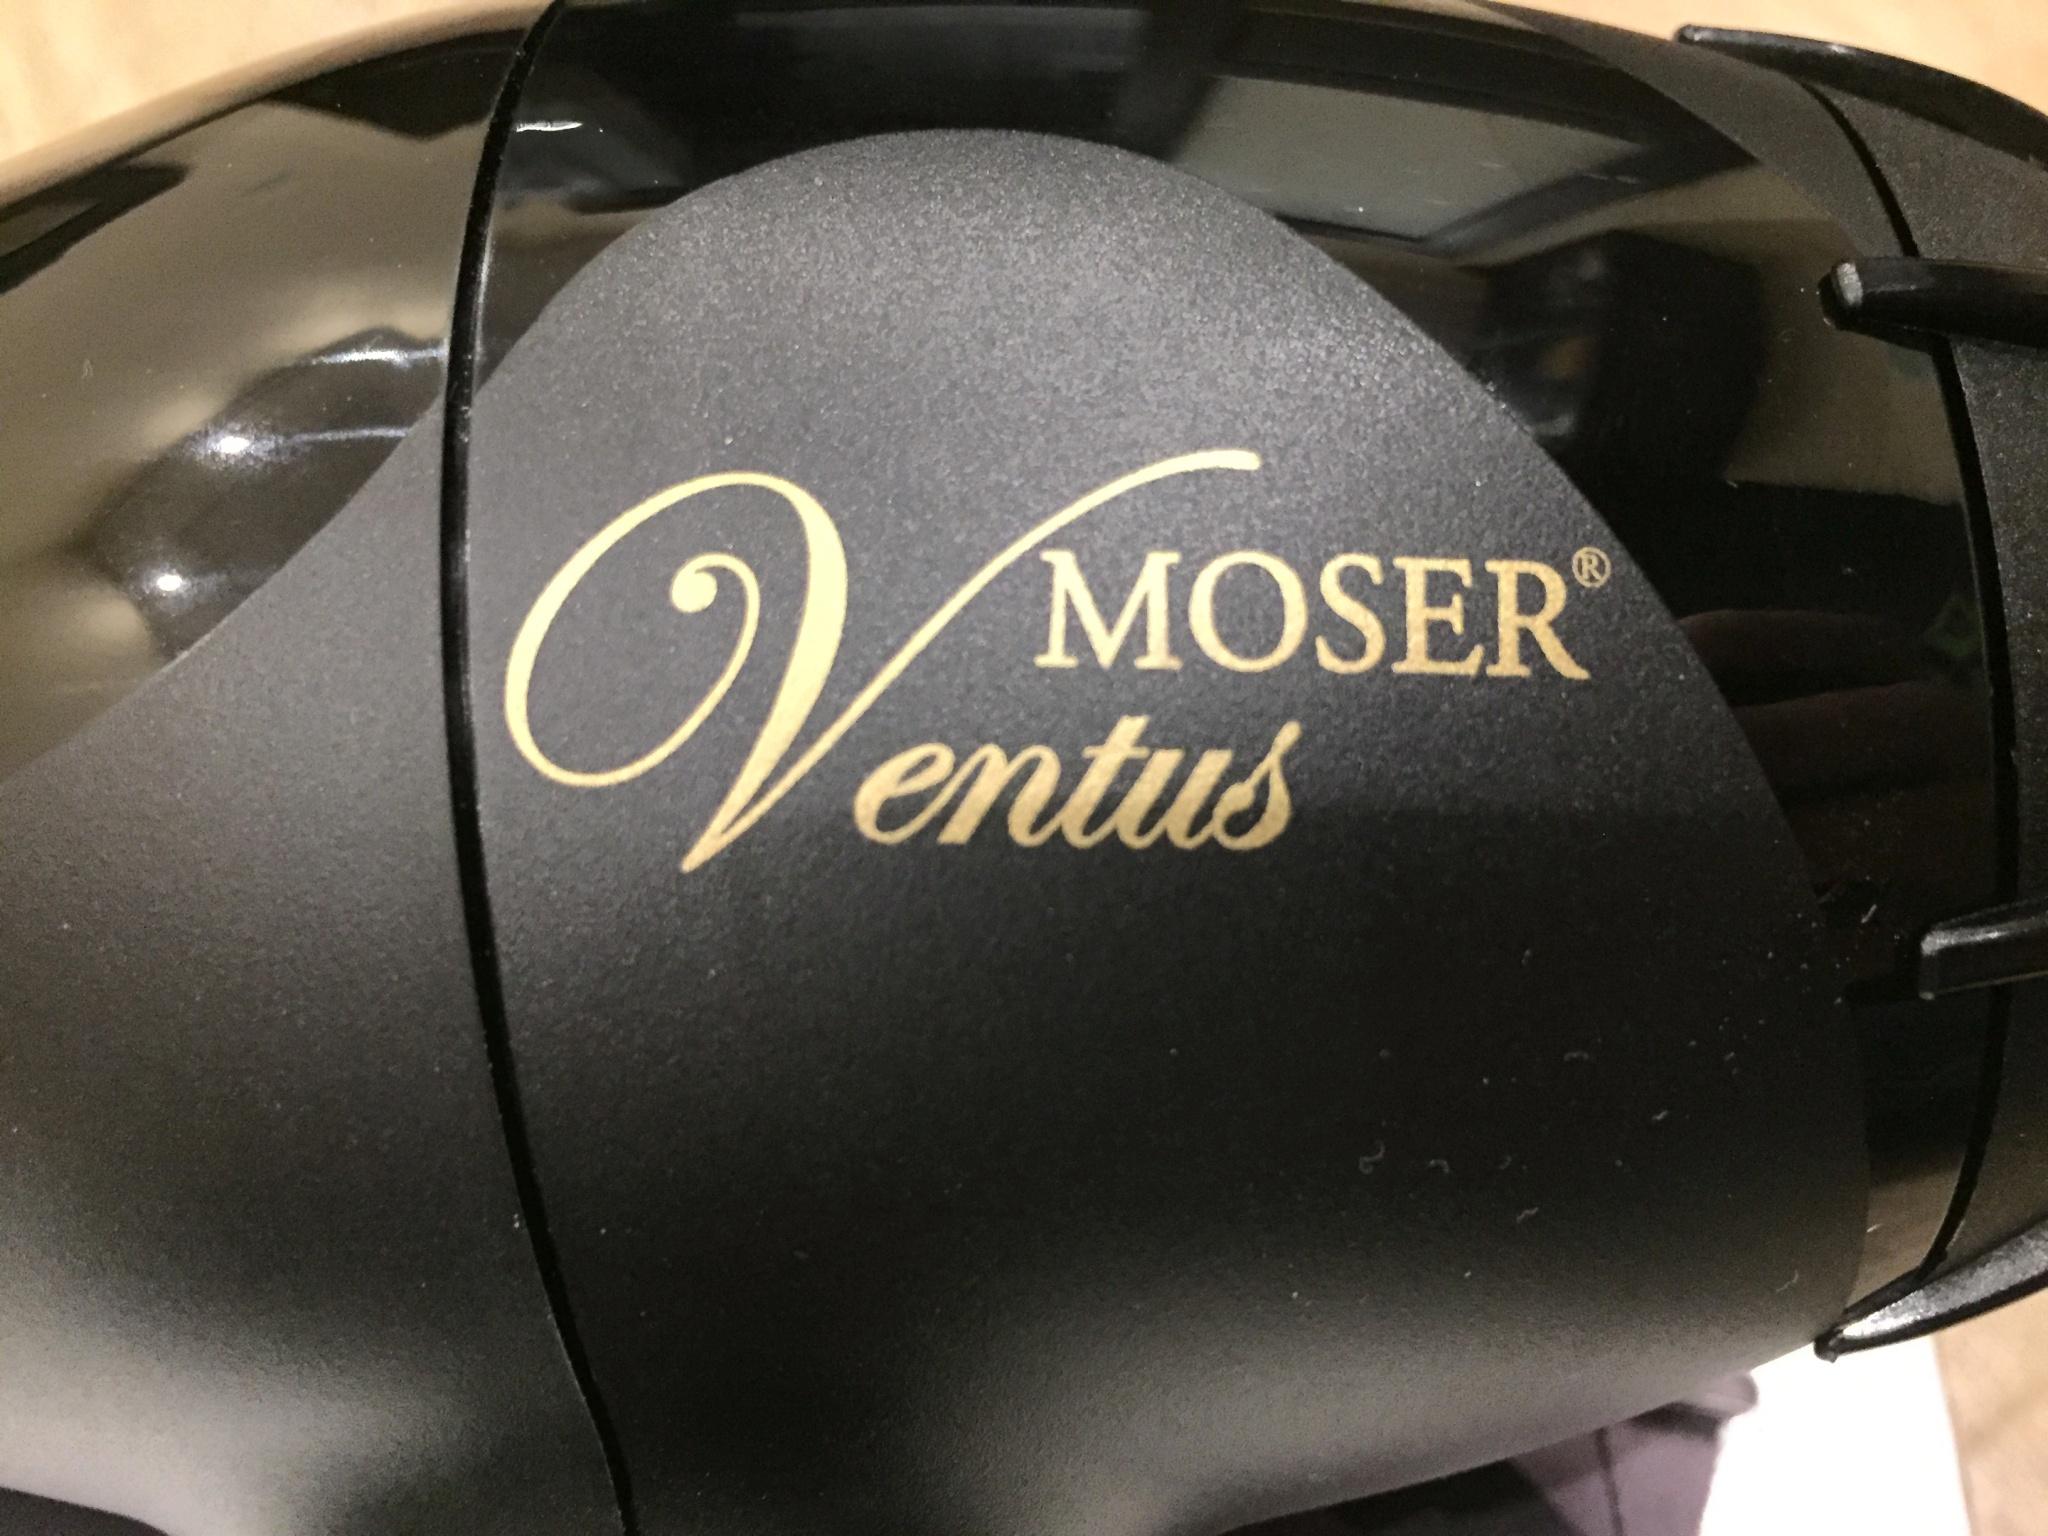 Обзор от покупателя на Фен Moser 4350-0050 Ventus — интернет-магазин ... 68eaba6bda79a